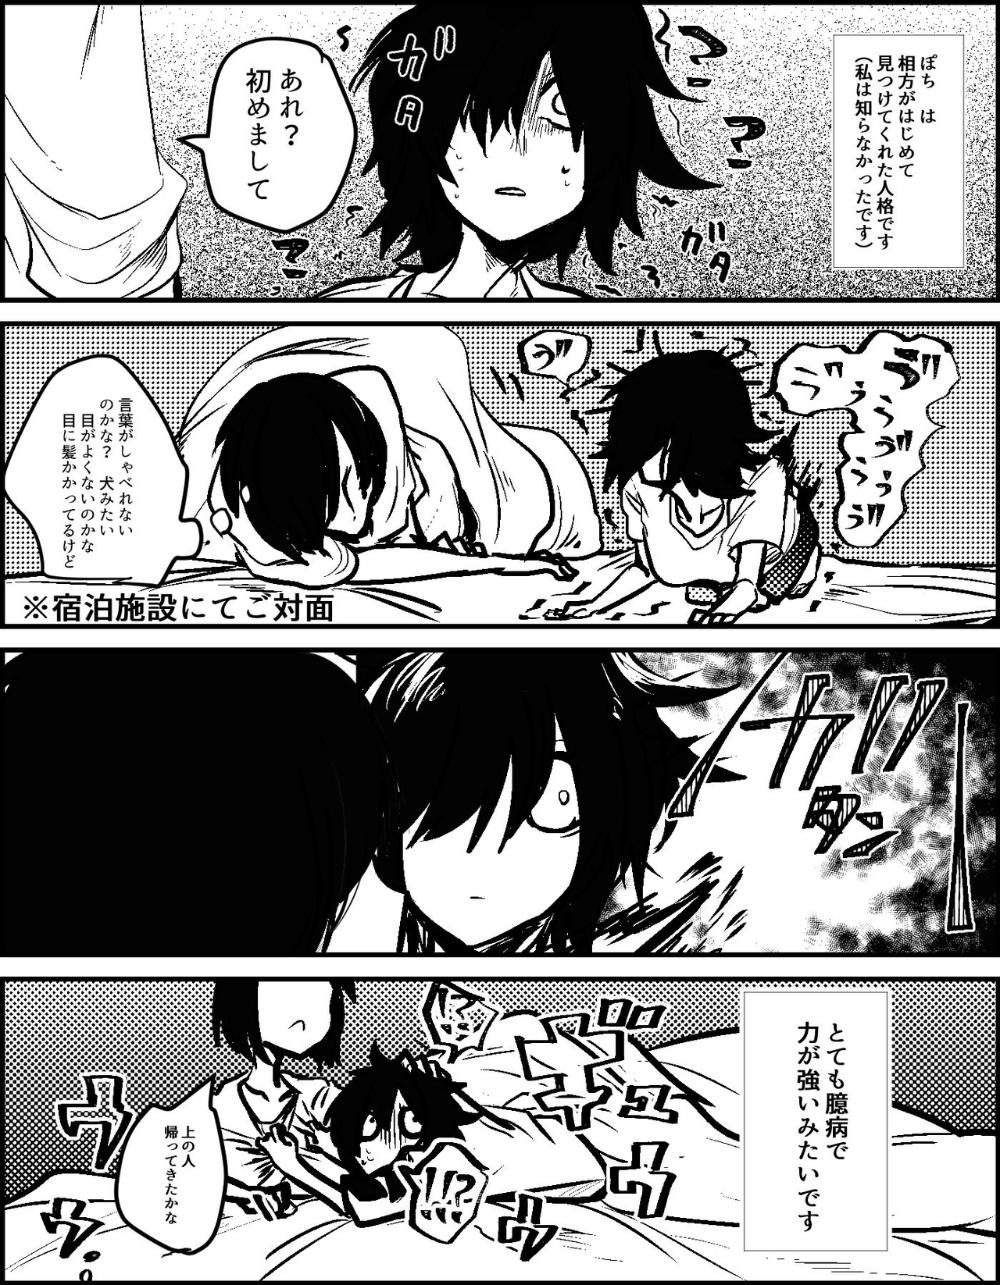 解離性同一性障害 - Google Search   Art, Anime, Study